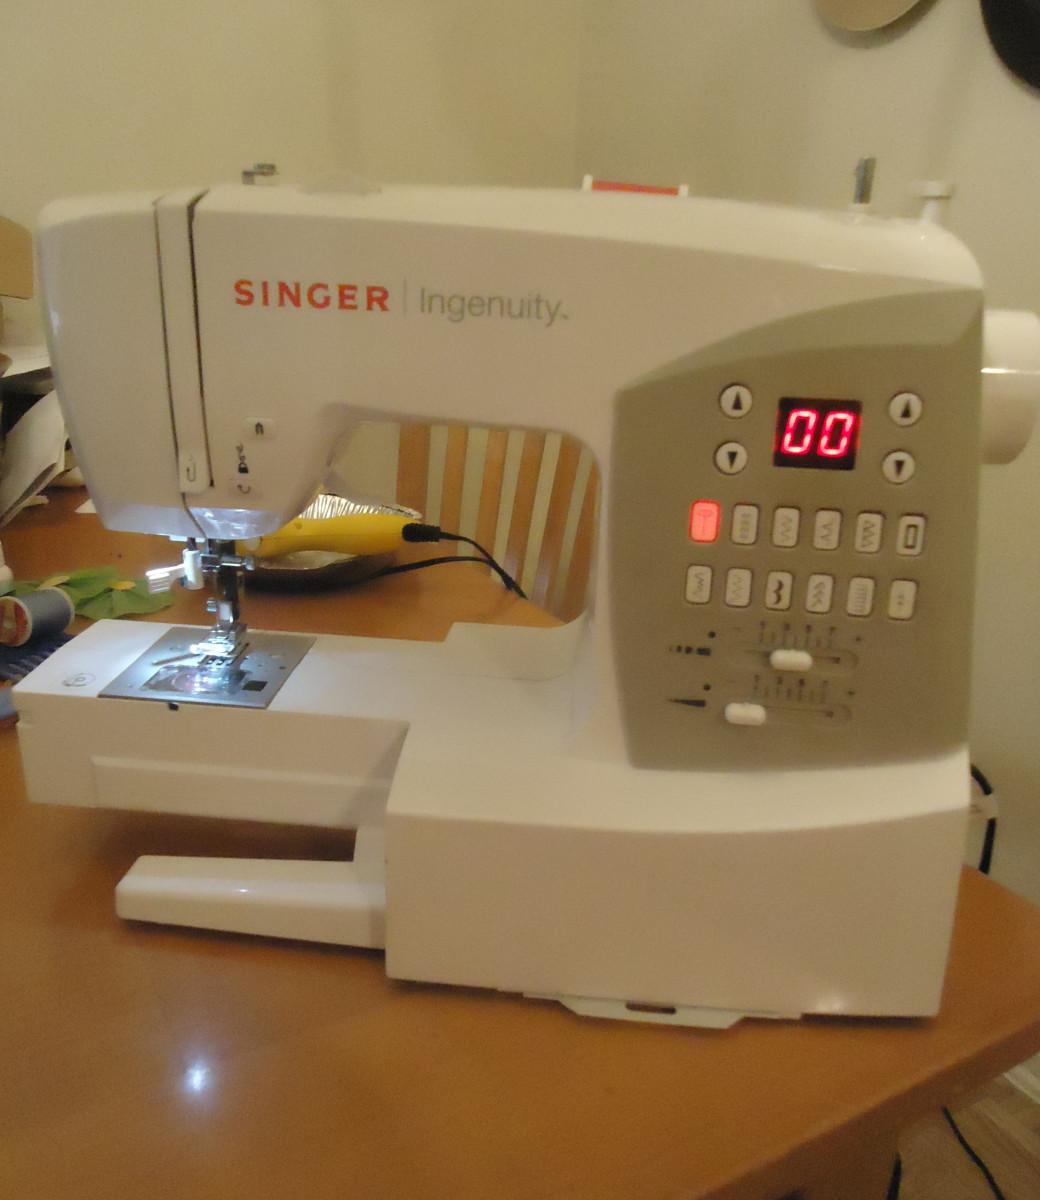 Singer Ingenuity Sewing Machine